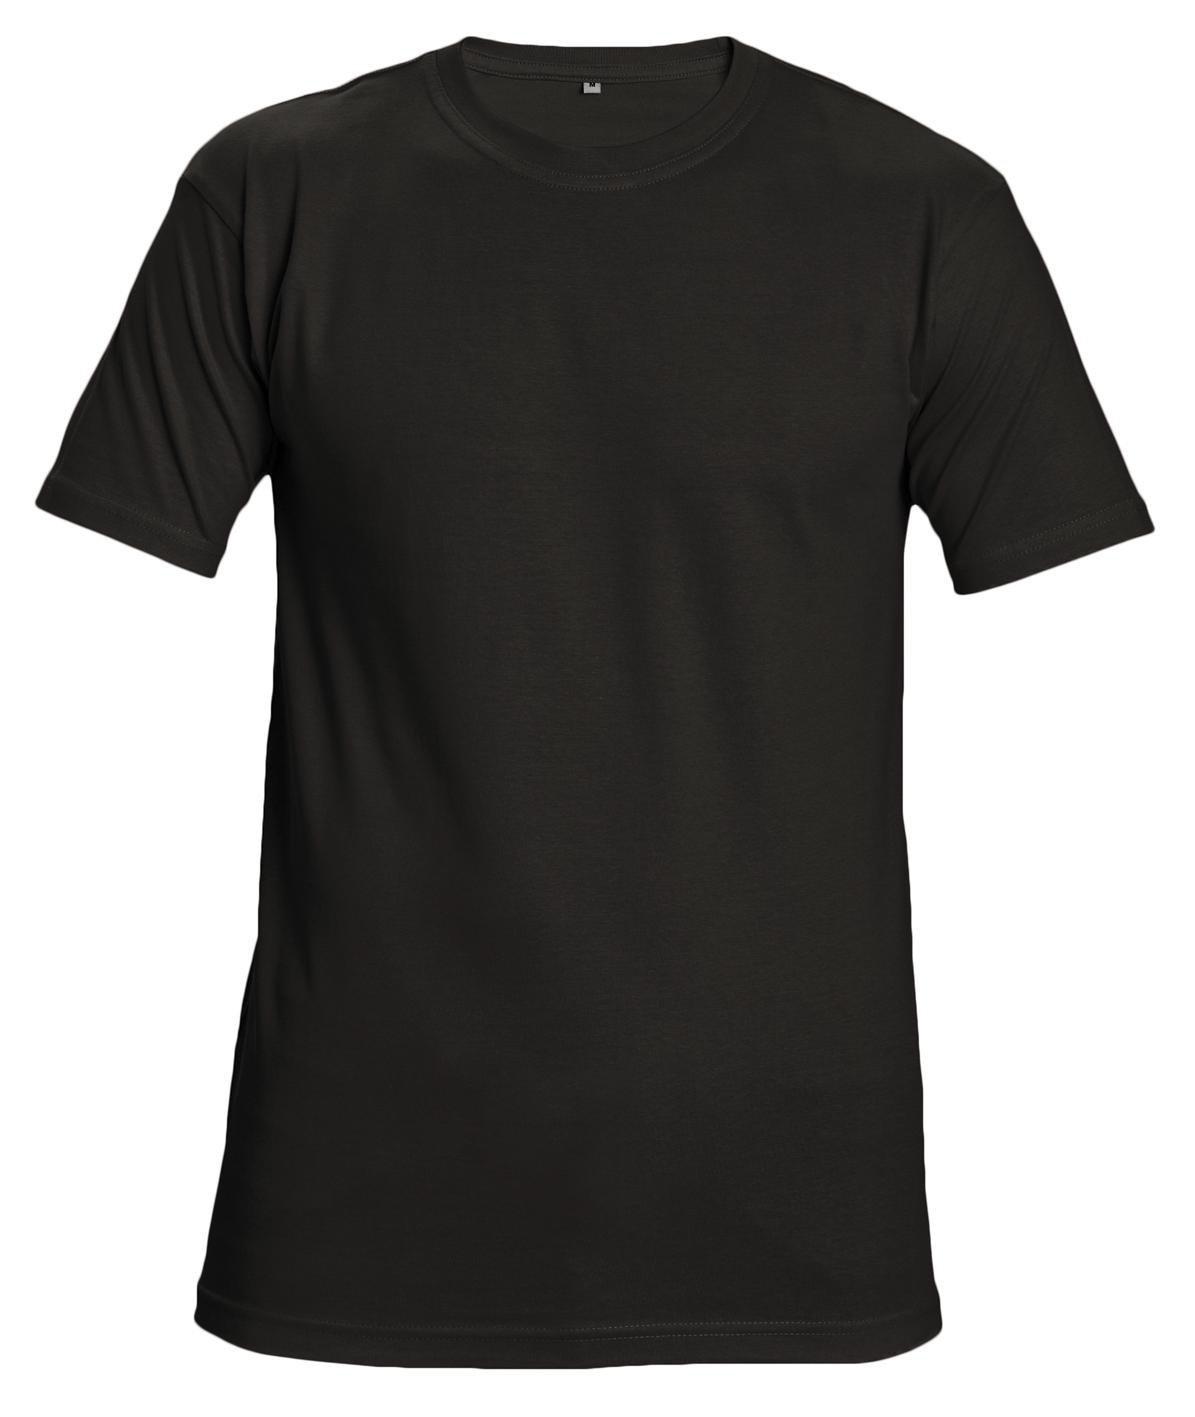 Image of   T-shirt Garai kort ærme